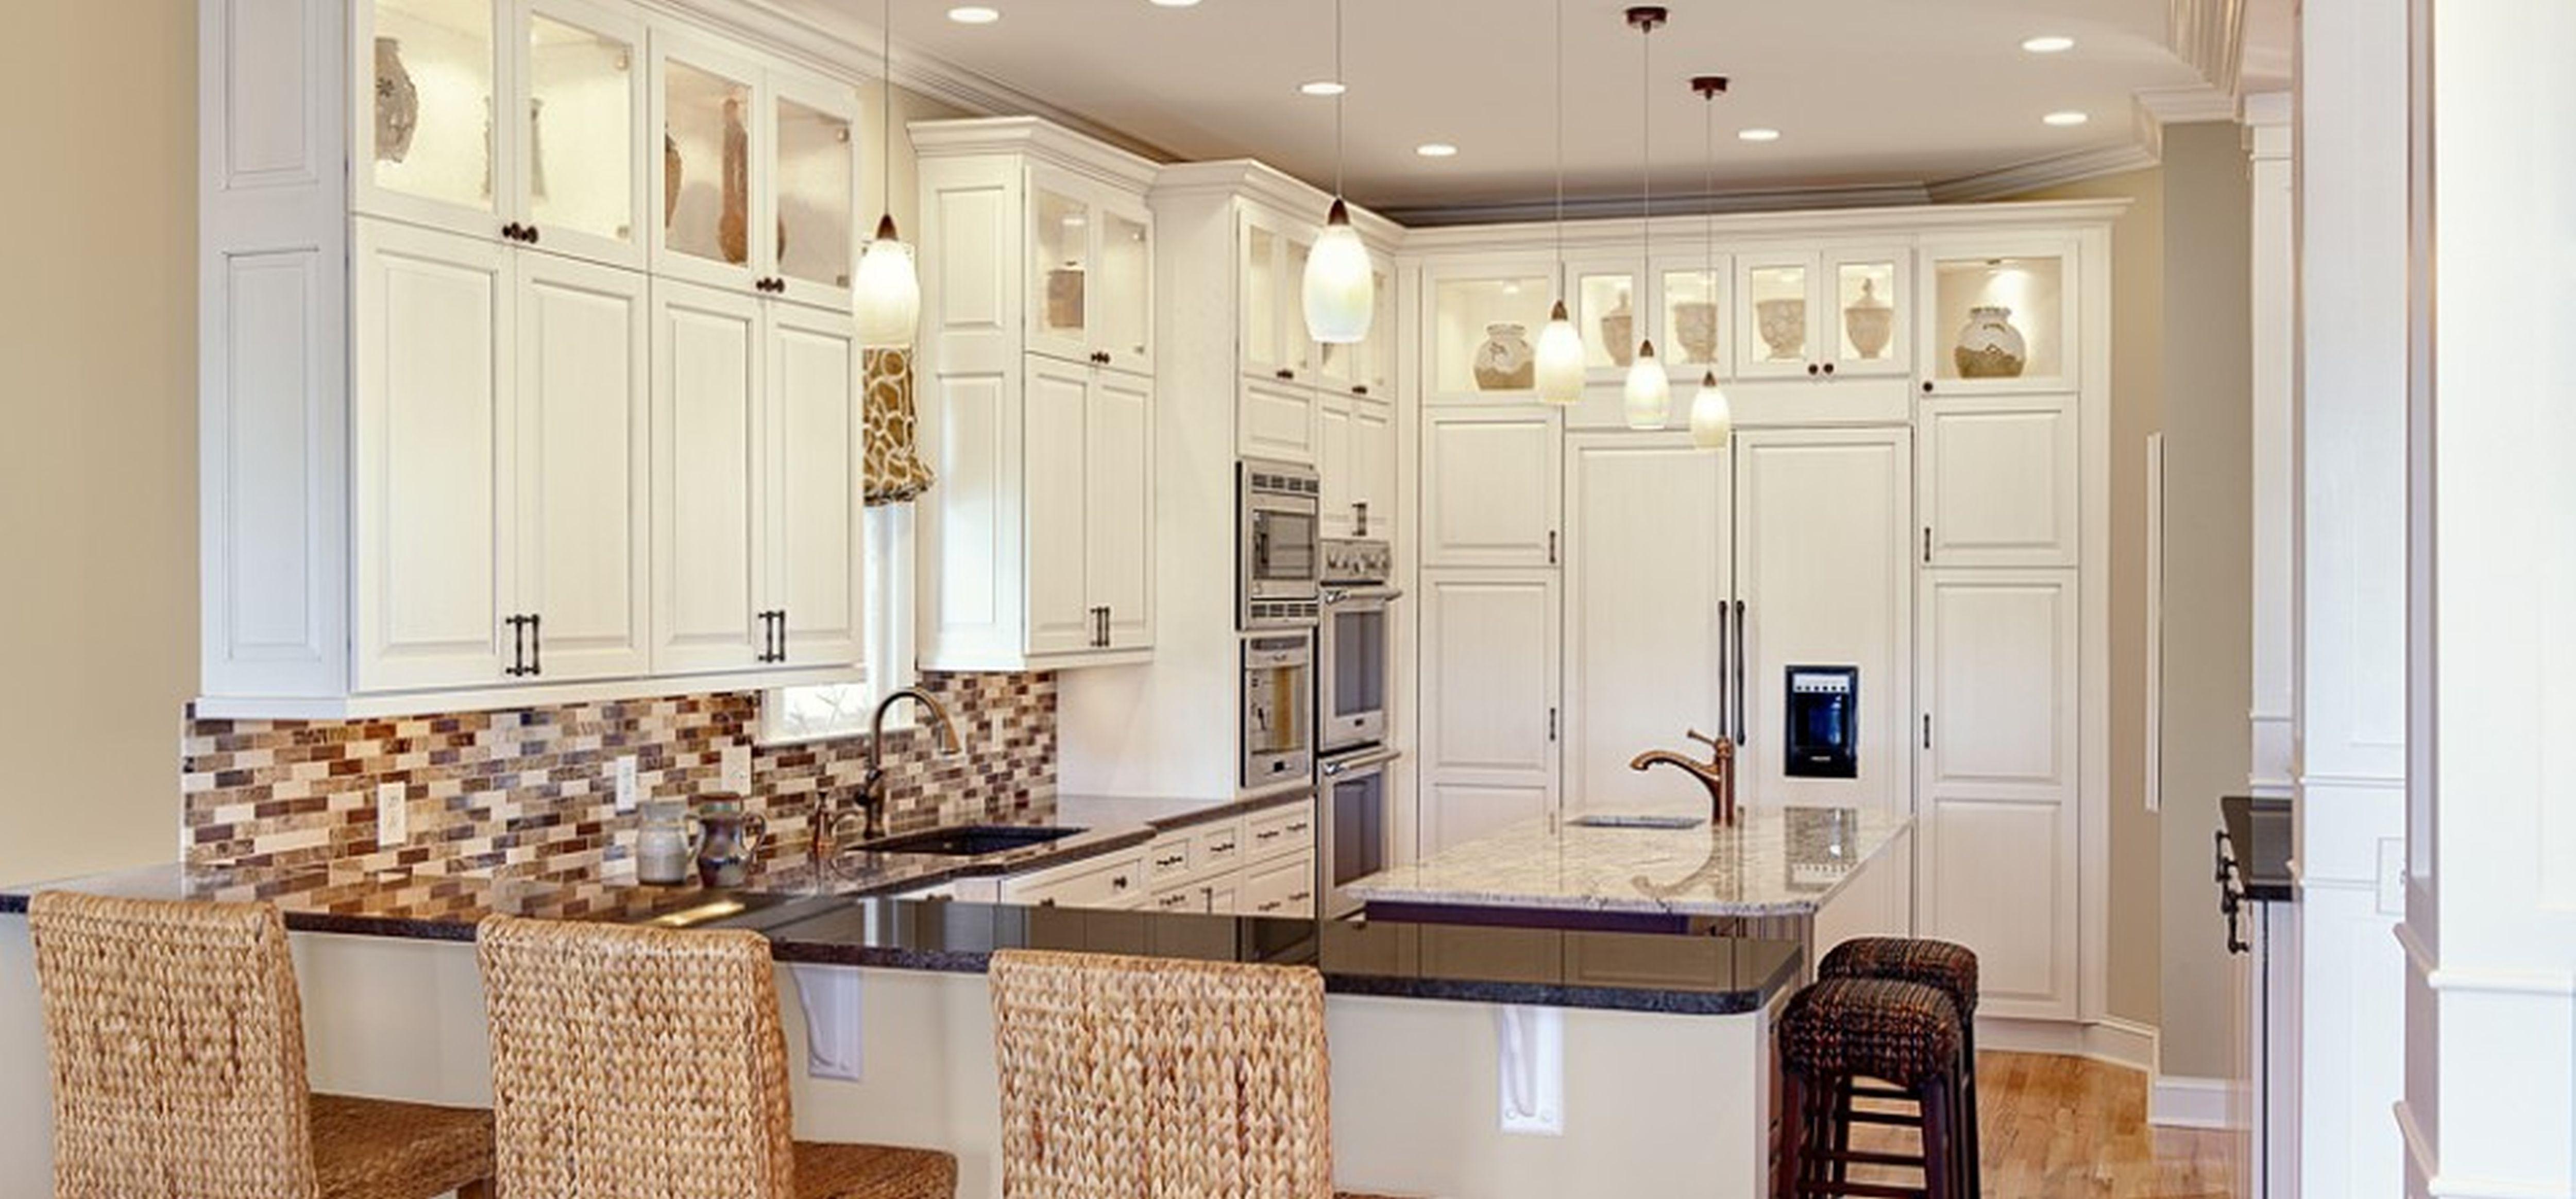 virtual remodel kitchen hanging shelves amazing design a http kitchenstir